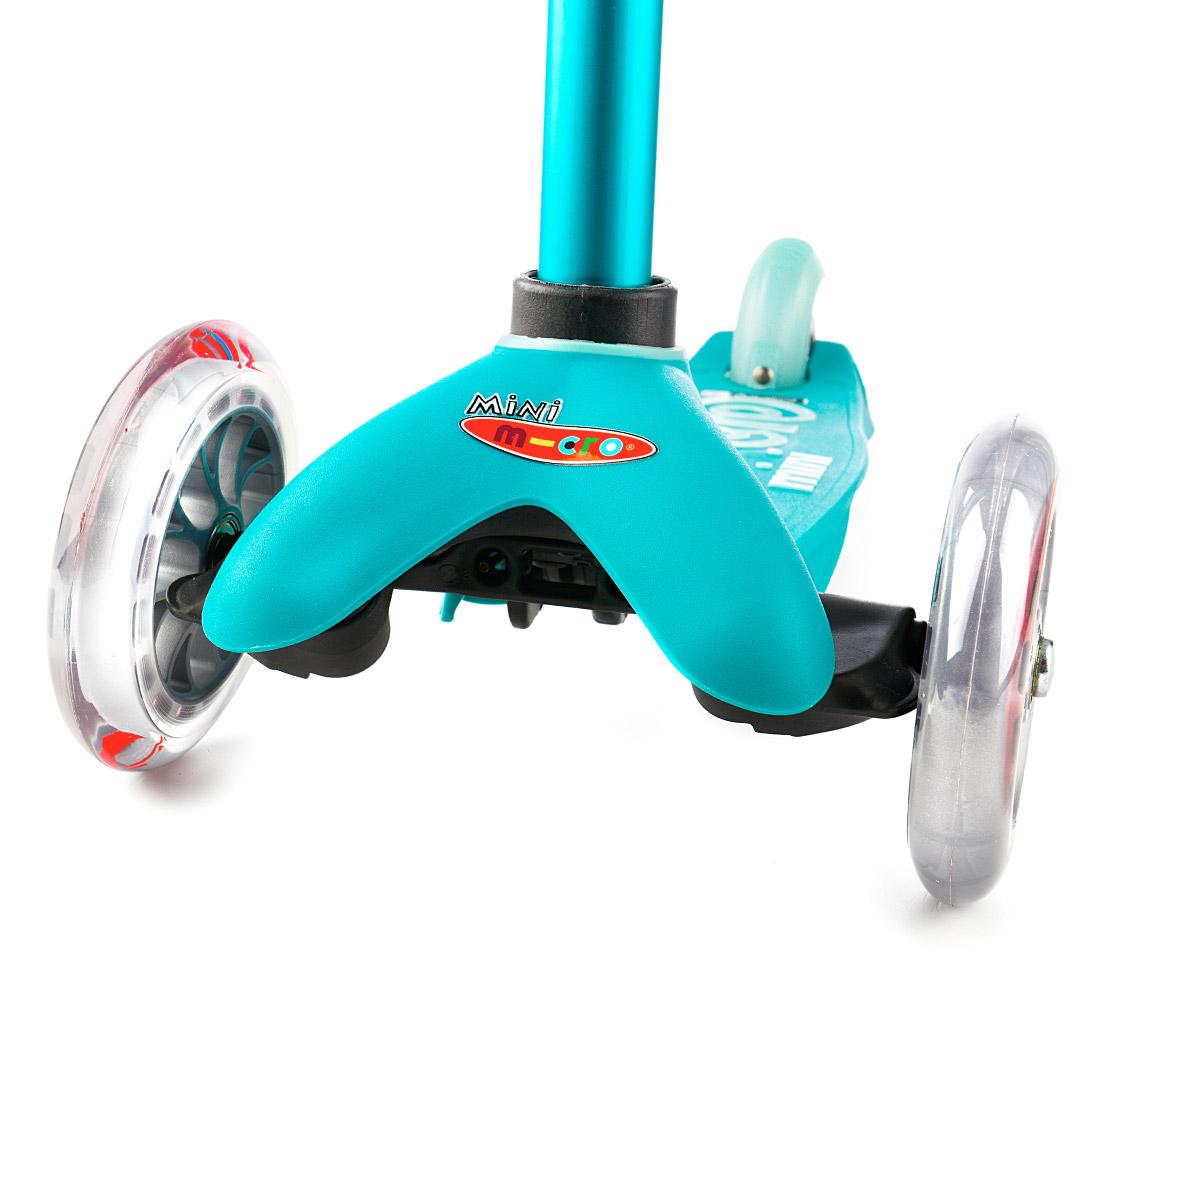 Cabinet Renewal Products: 【楽天市場】【マイクロスクーター】ミニ・マイクロ・デラックススクーター マイクロキックボード キックスクーター